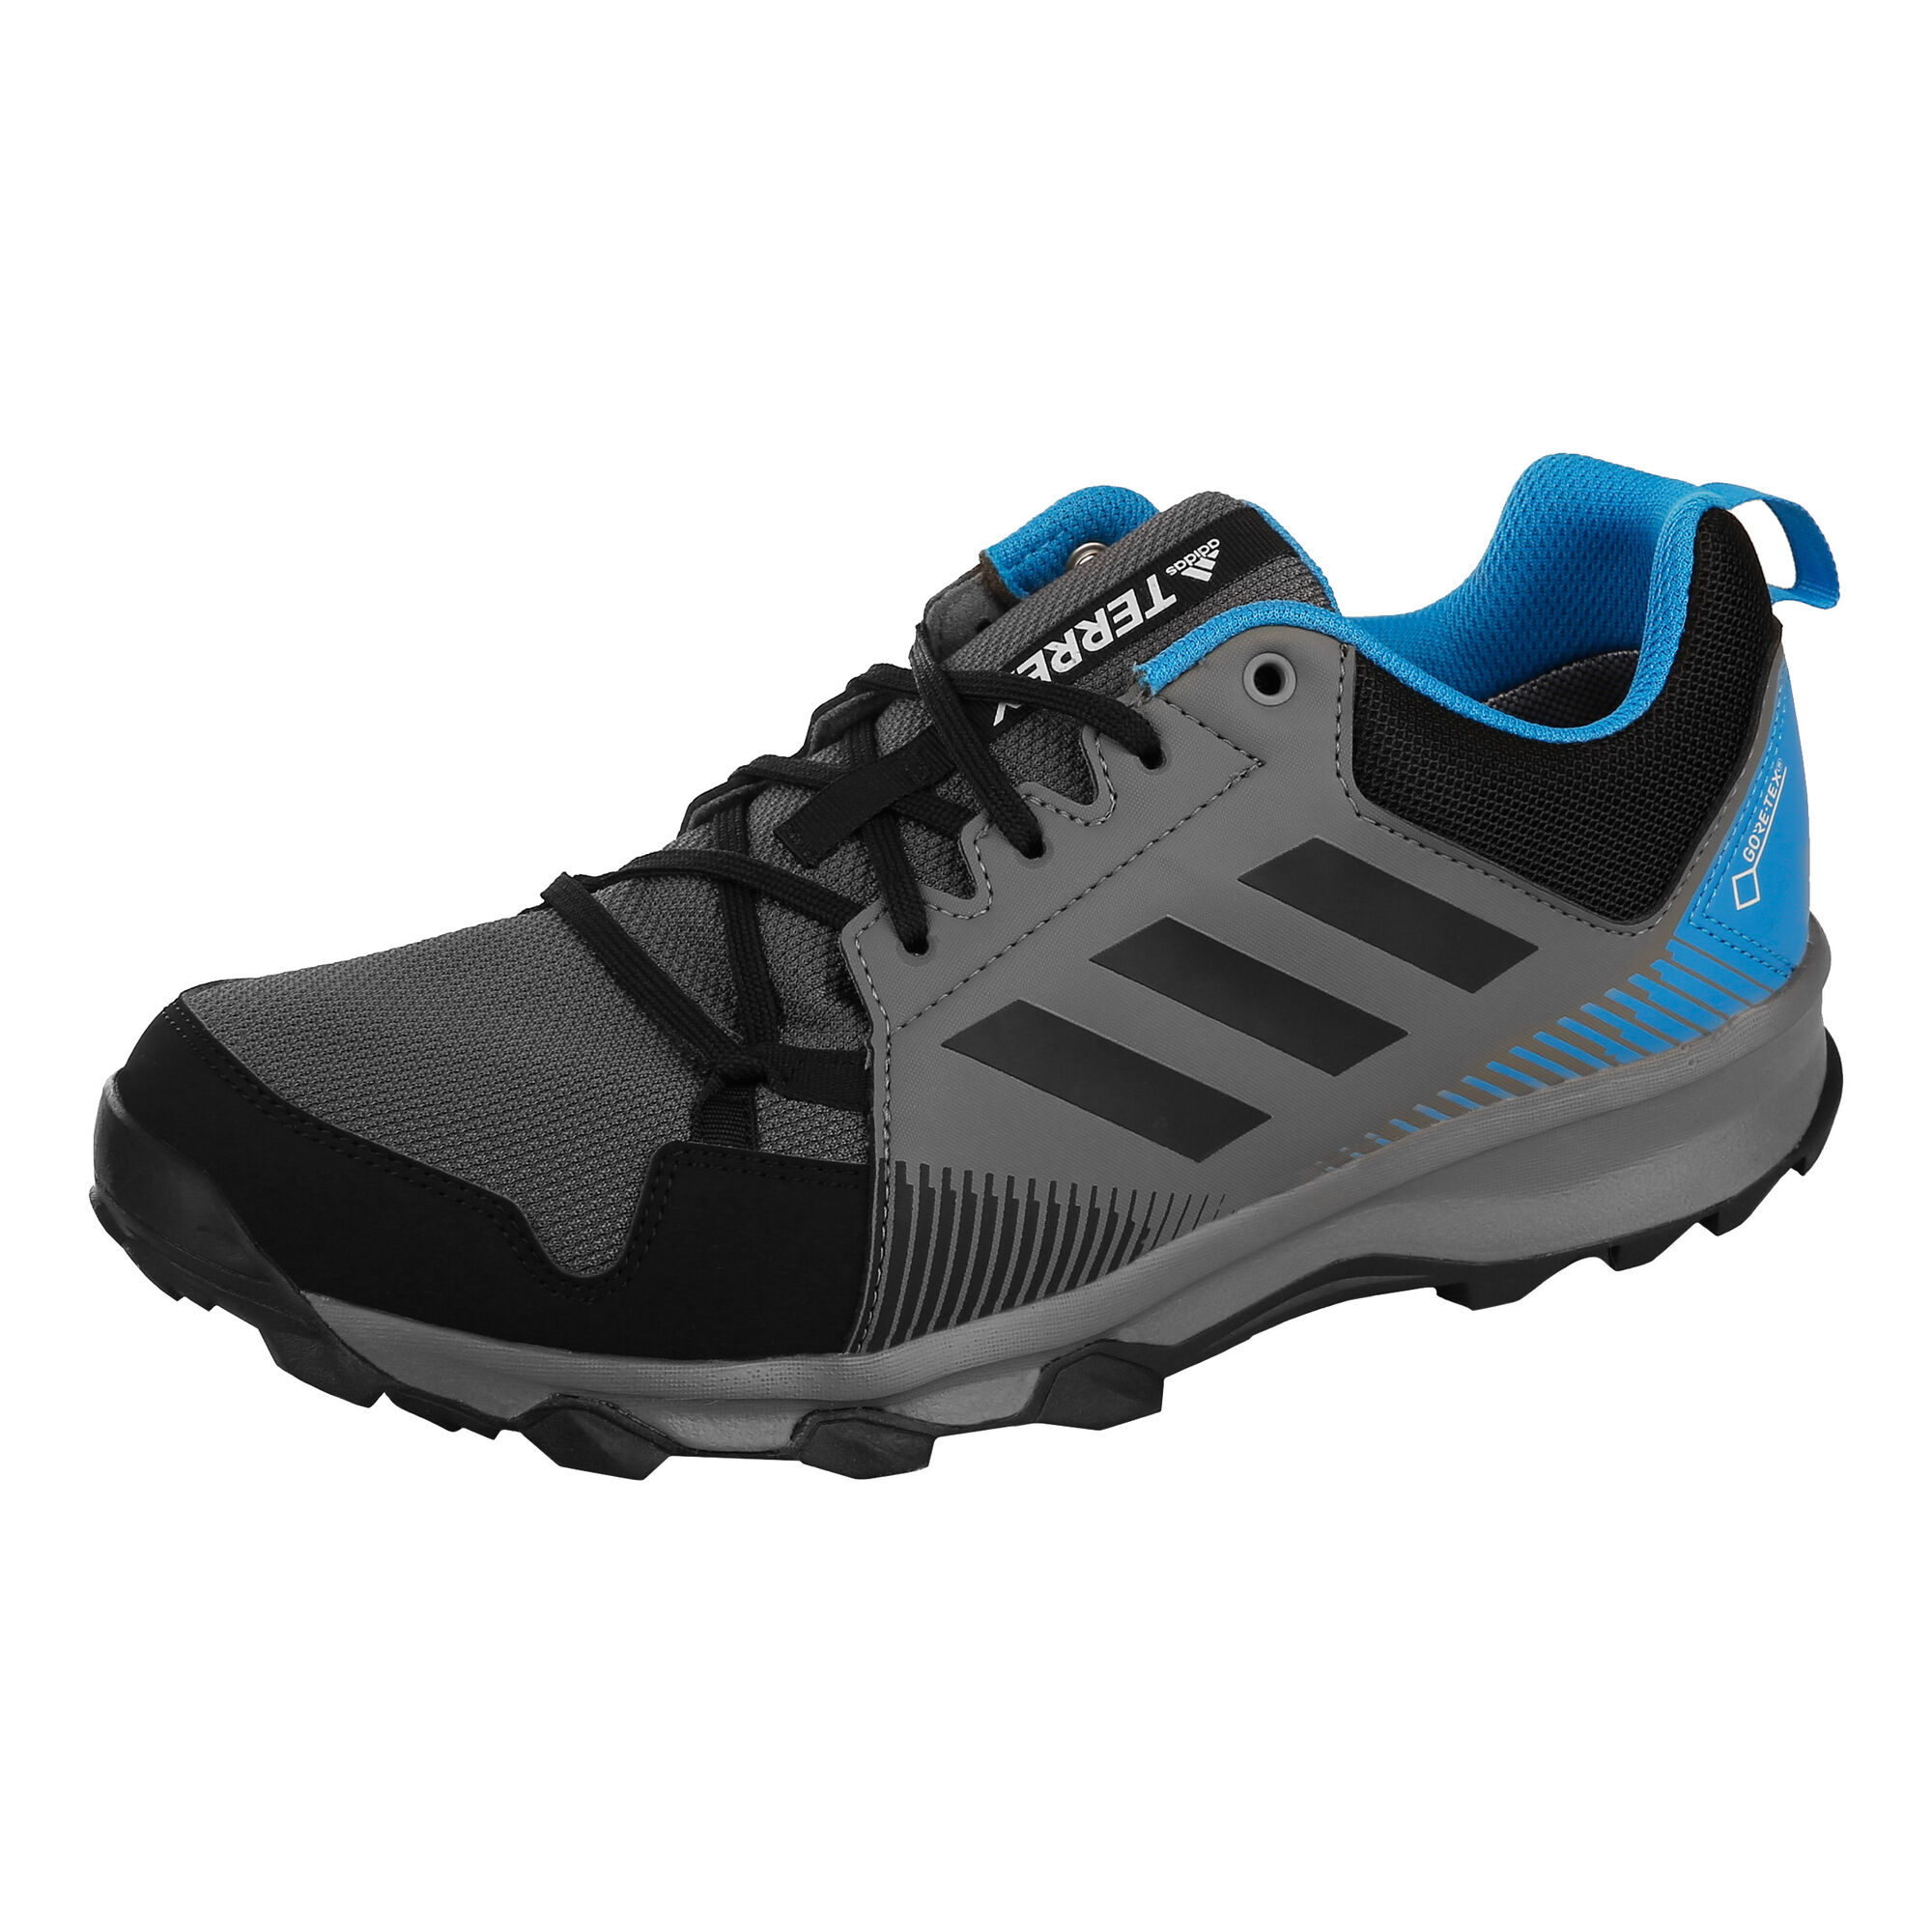 e479789b0e3 adidas · adidas · adidas · adidas · adidas · adidas · adidas · adidas ·  adidas. Terrex Tracerocker GTX Men ...